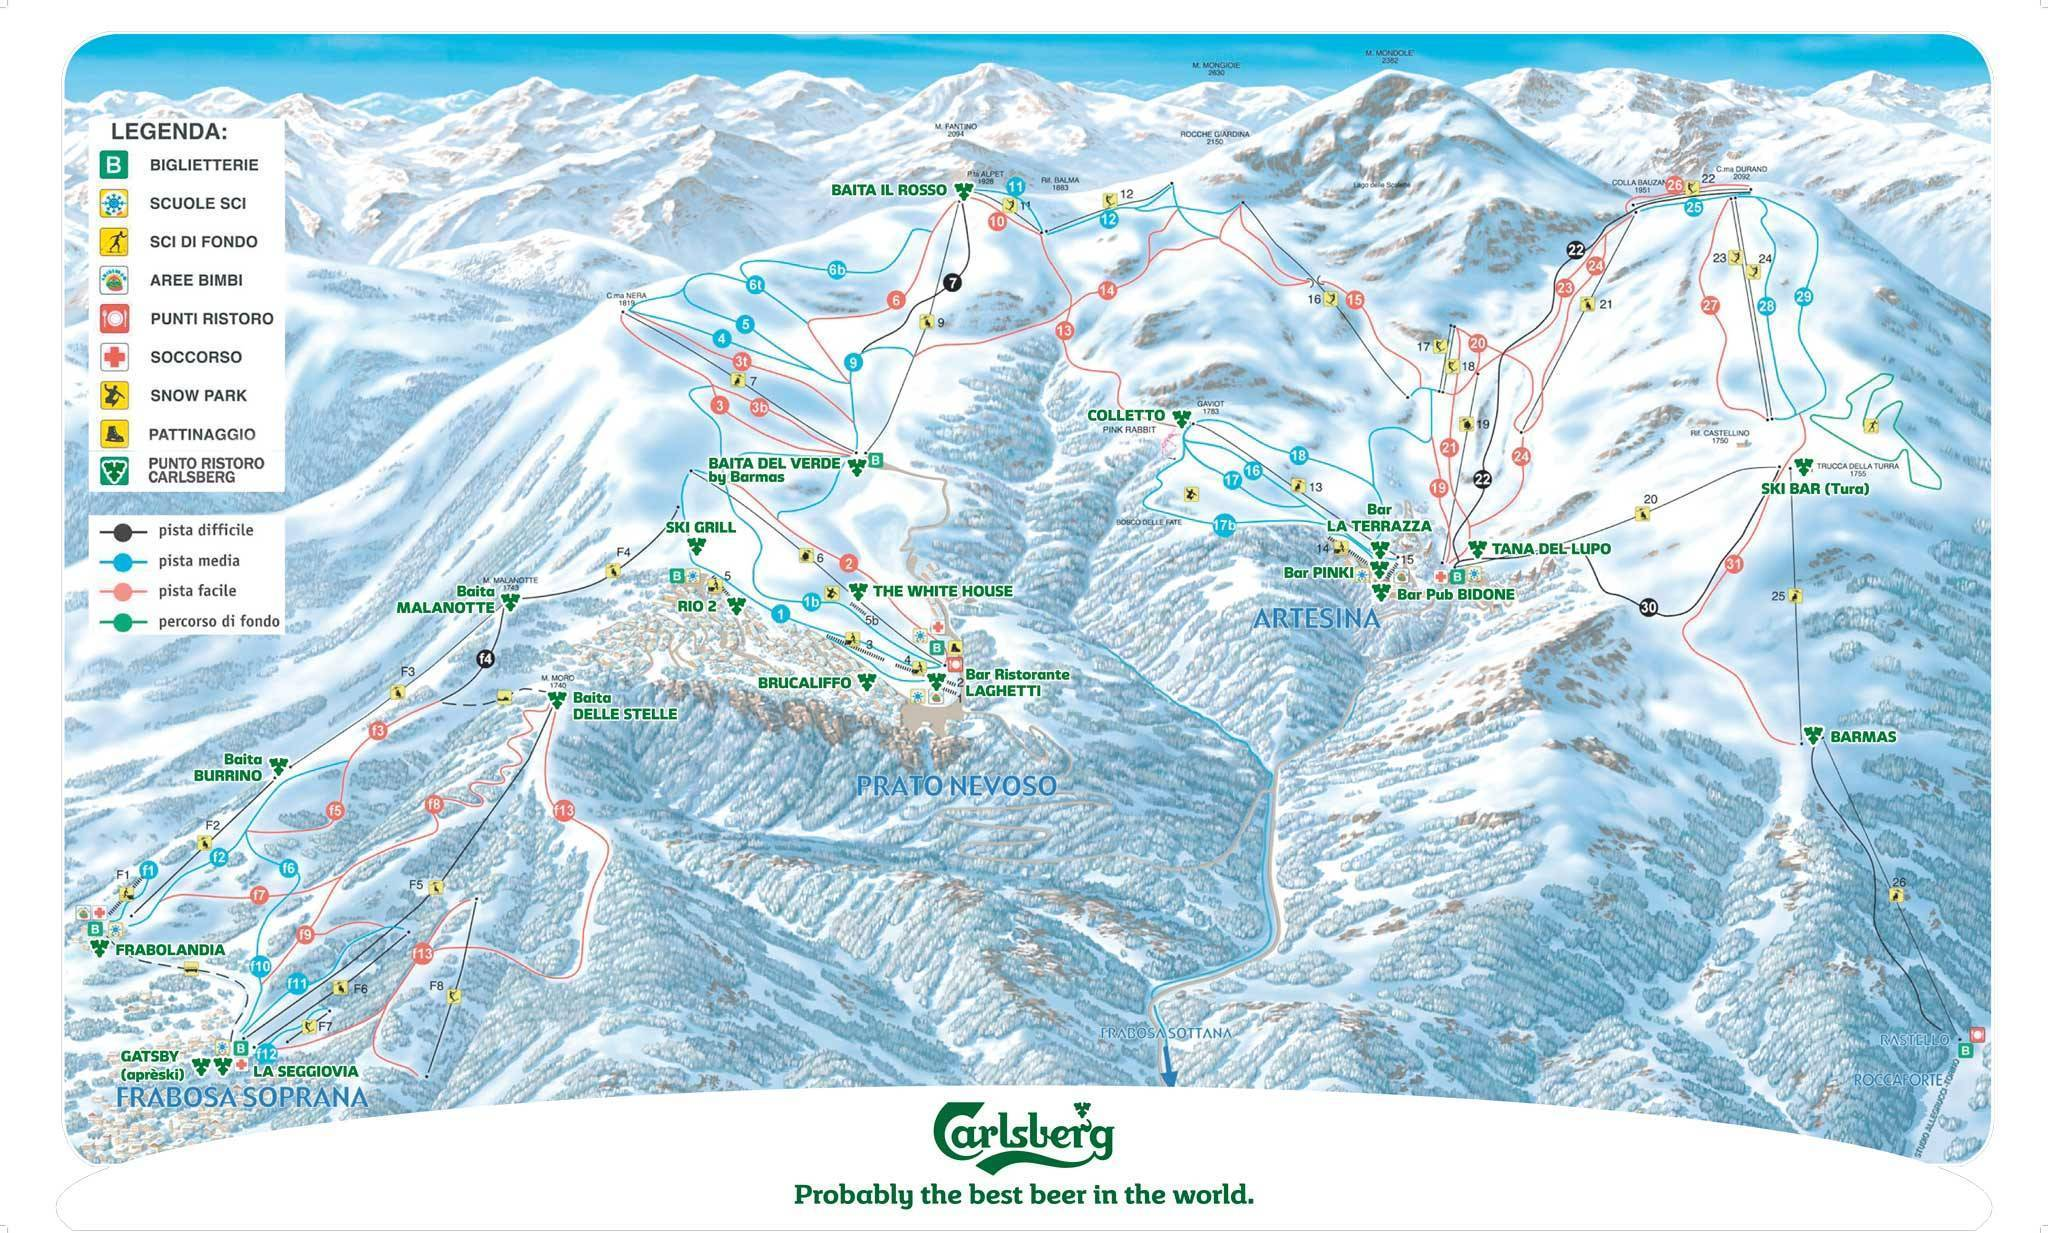 Mondolè Ski – Artesina / Frabosa Soprana / Prato Nevoso